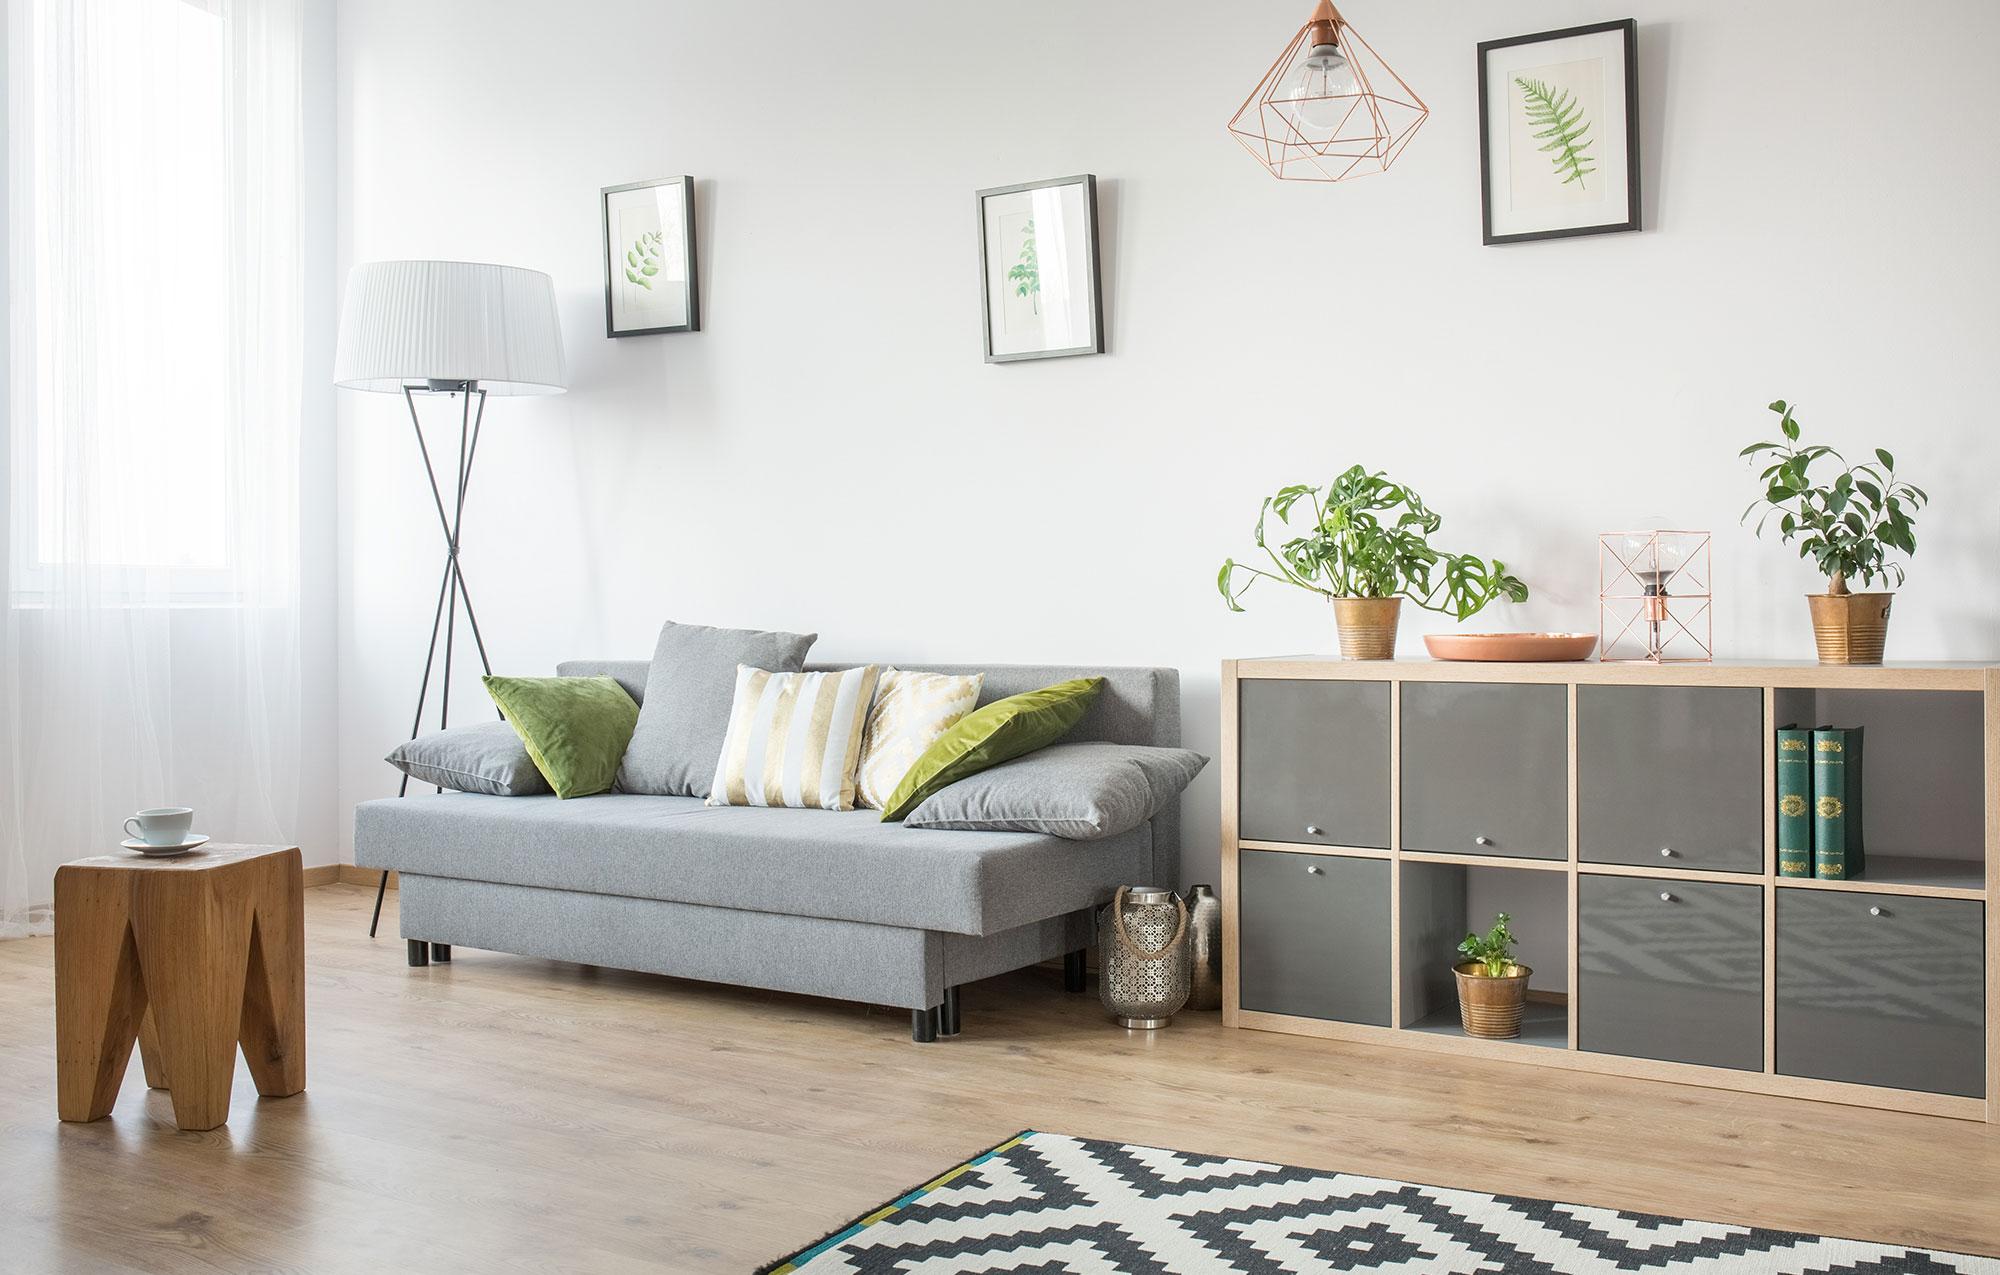 Sofa and Organizational Cube